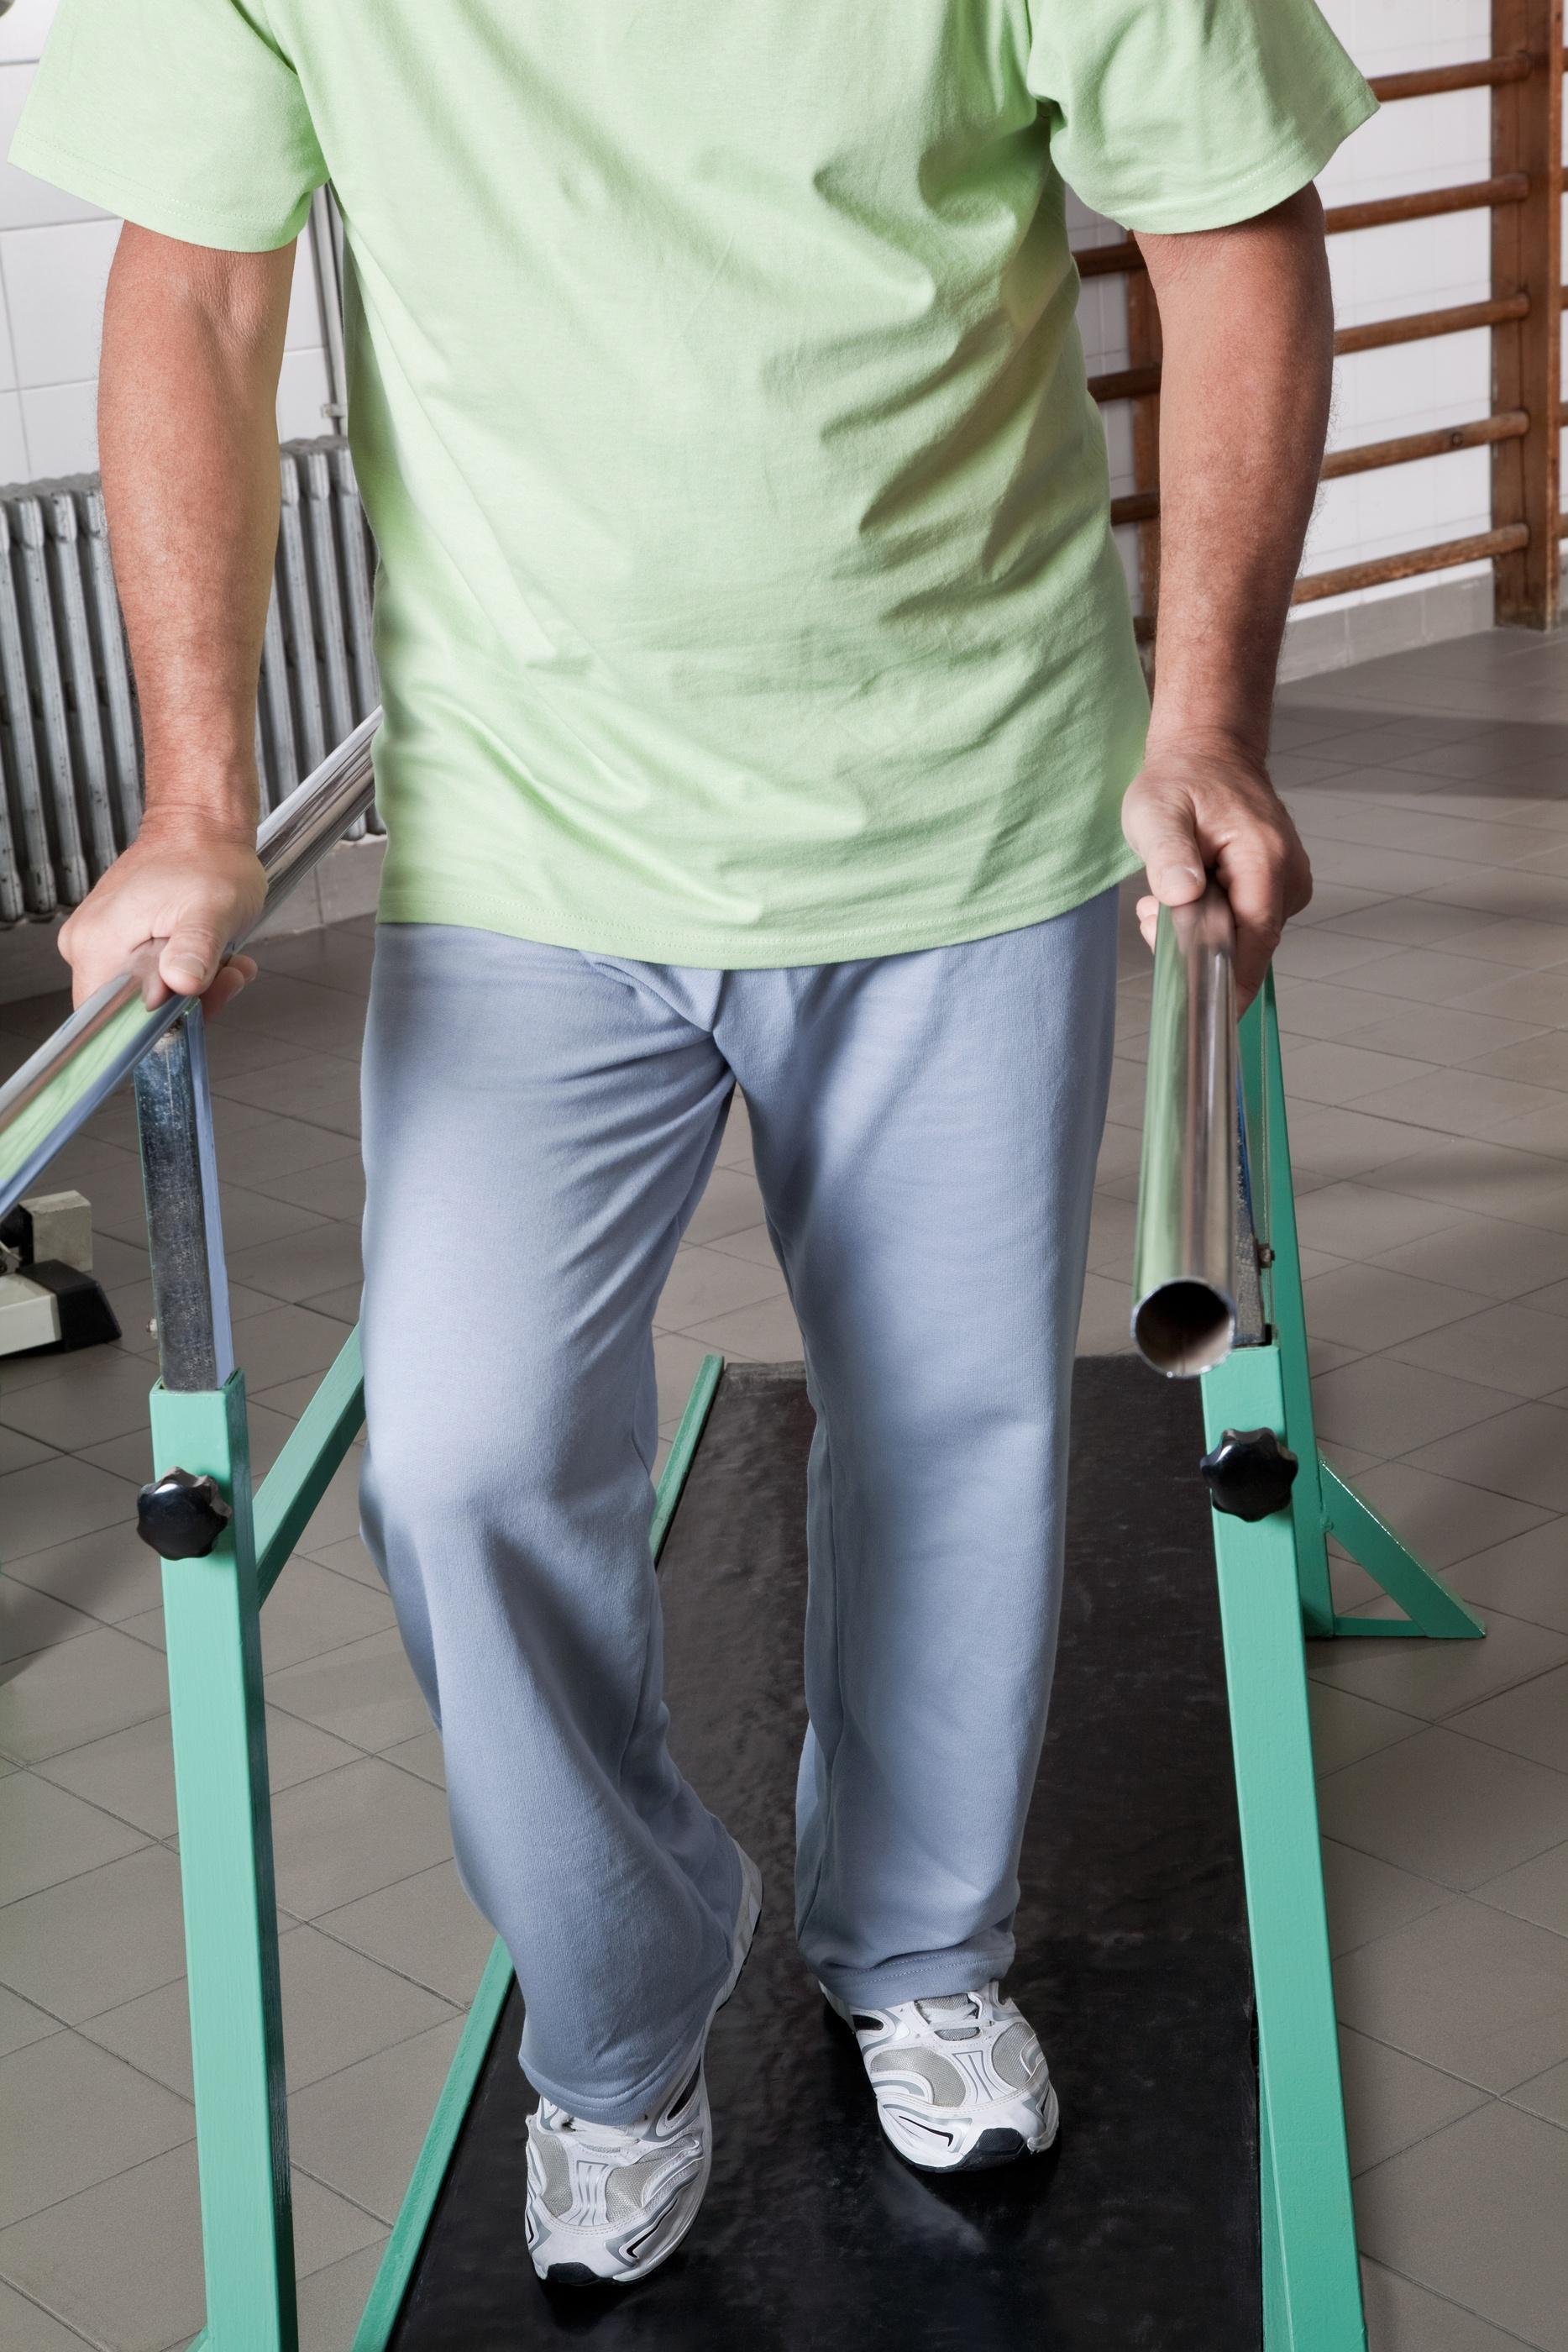 bigstock-Portrait-of-Senior-man-having--34326326.jpg